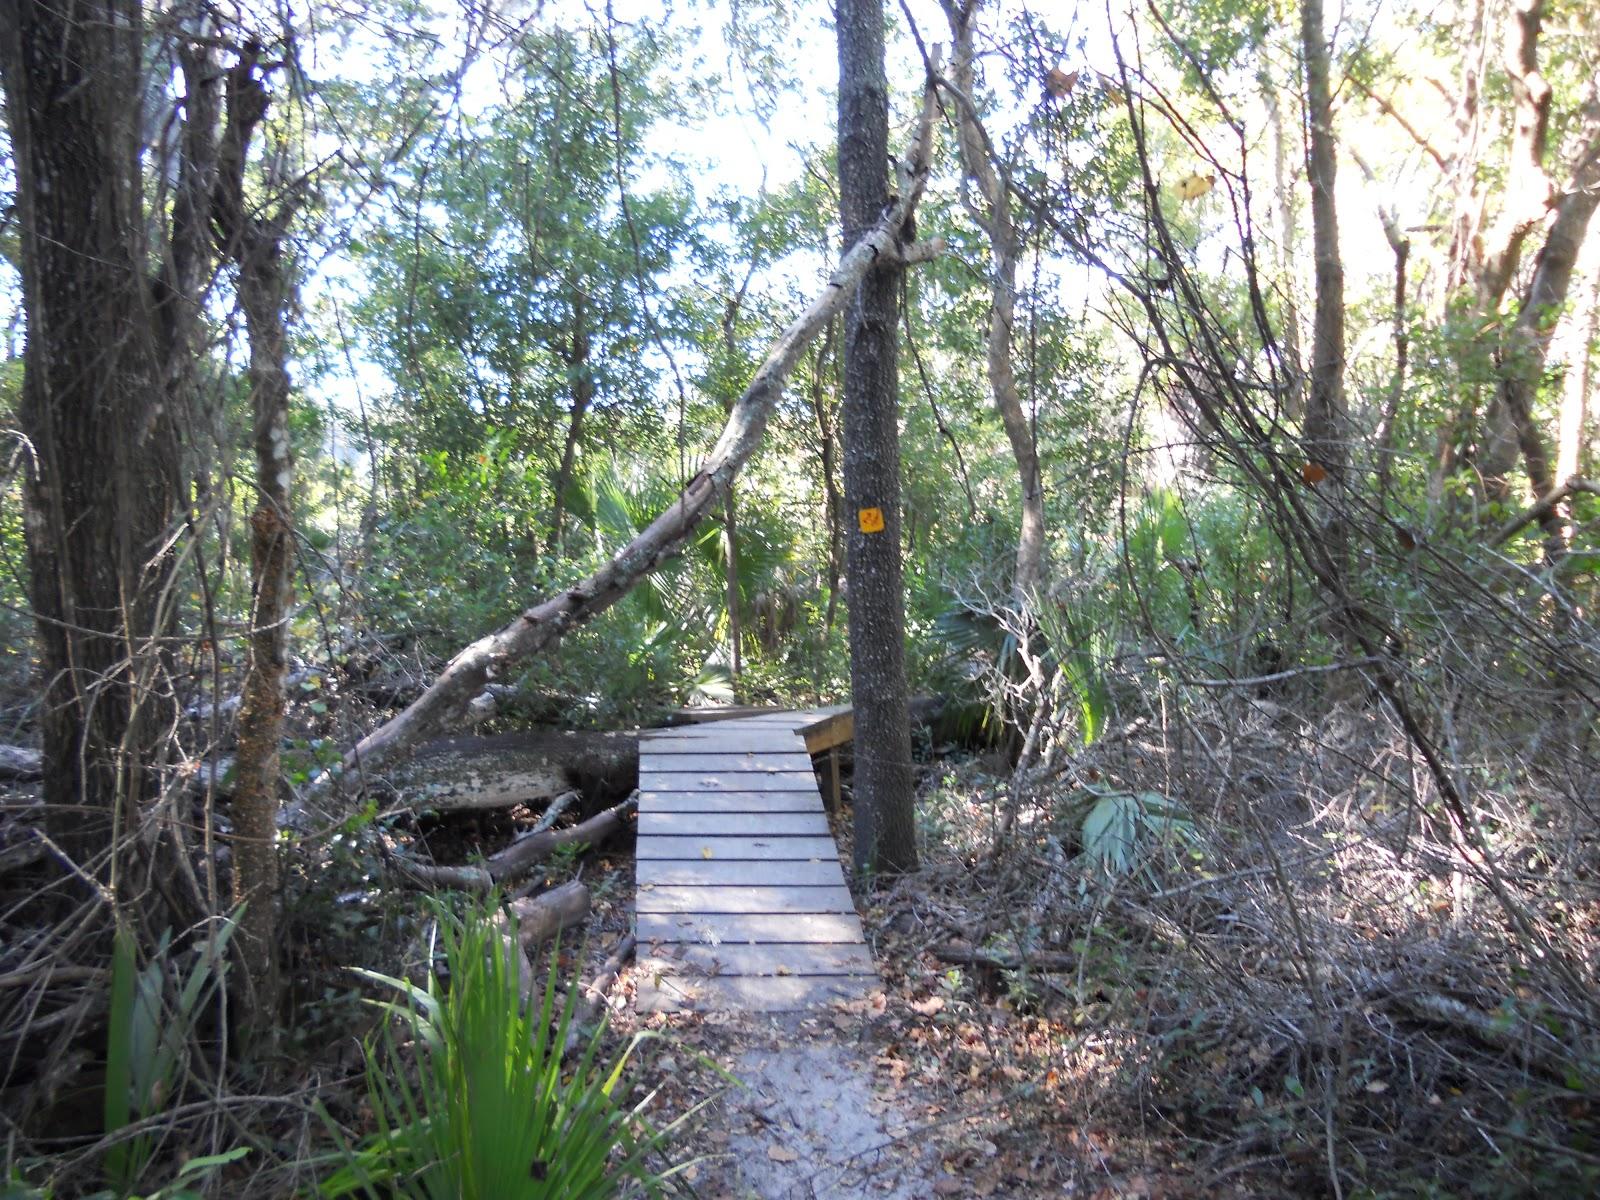 Mountain Bikes Trails in Florida Trail Map Mountain Bike